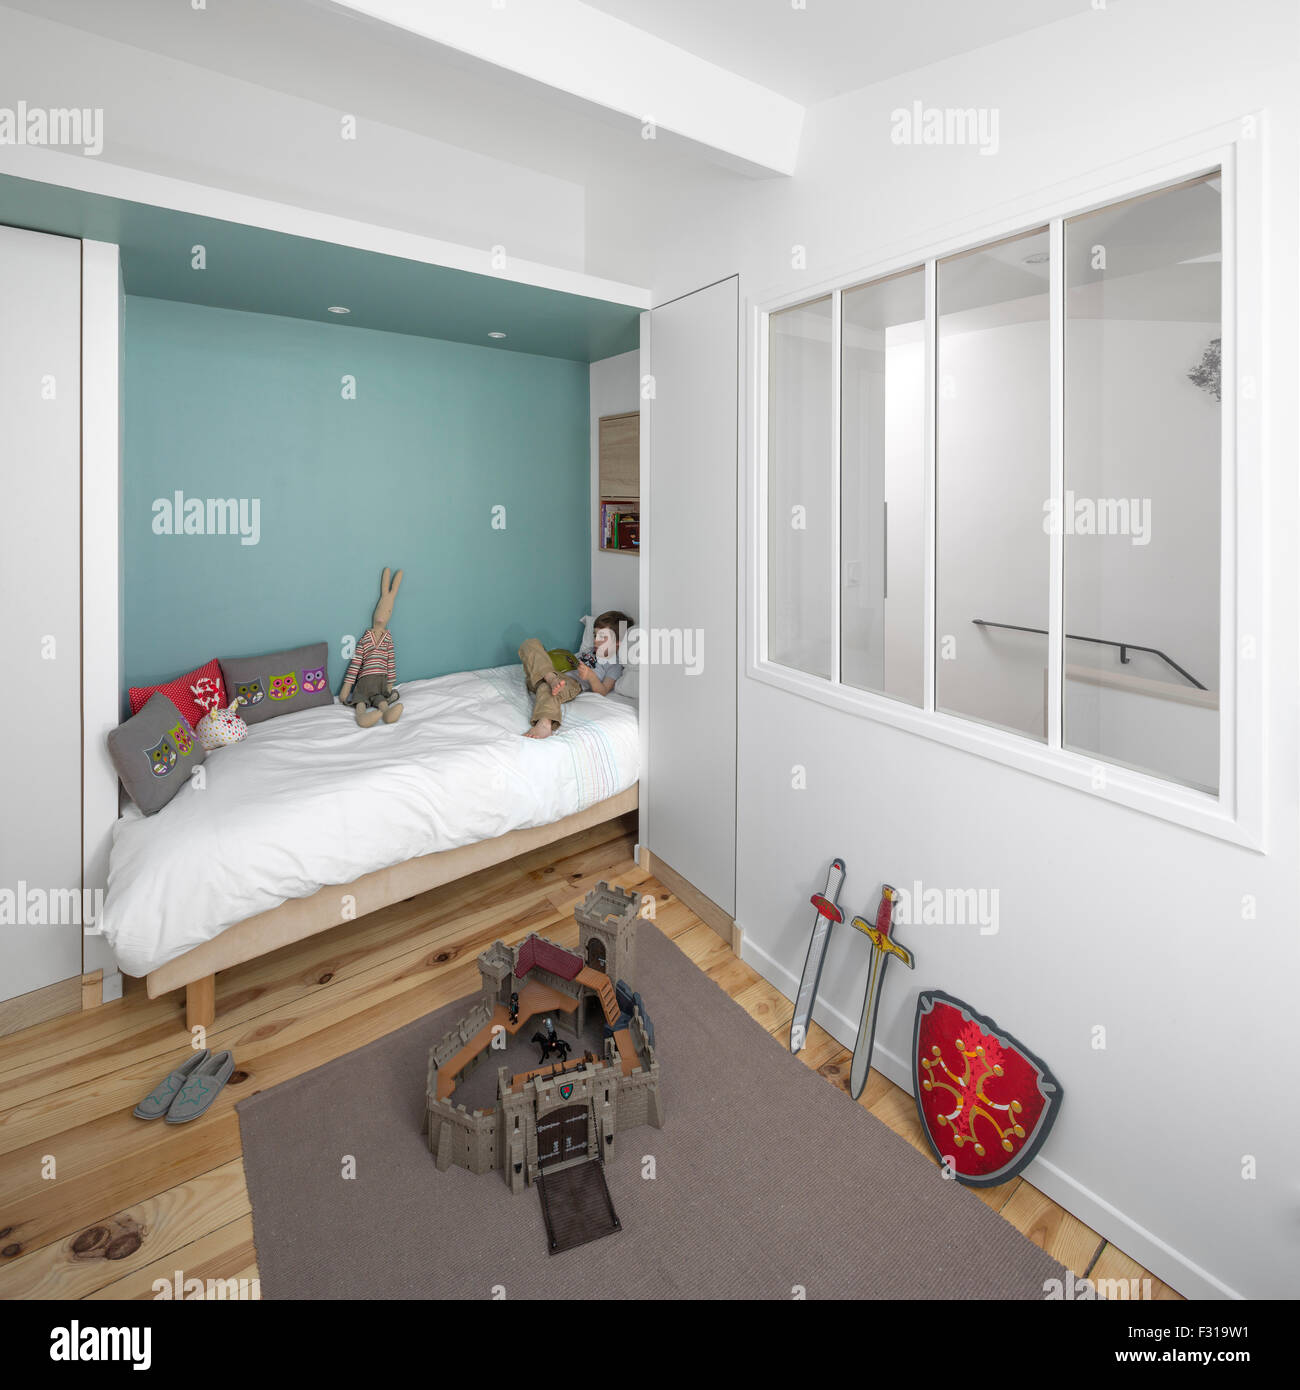 childs bedroom decoration stock photos childs bedroom decoration stock images alamy. Black Bedroom Furniture Sets. Home Design Ideas